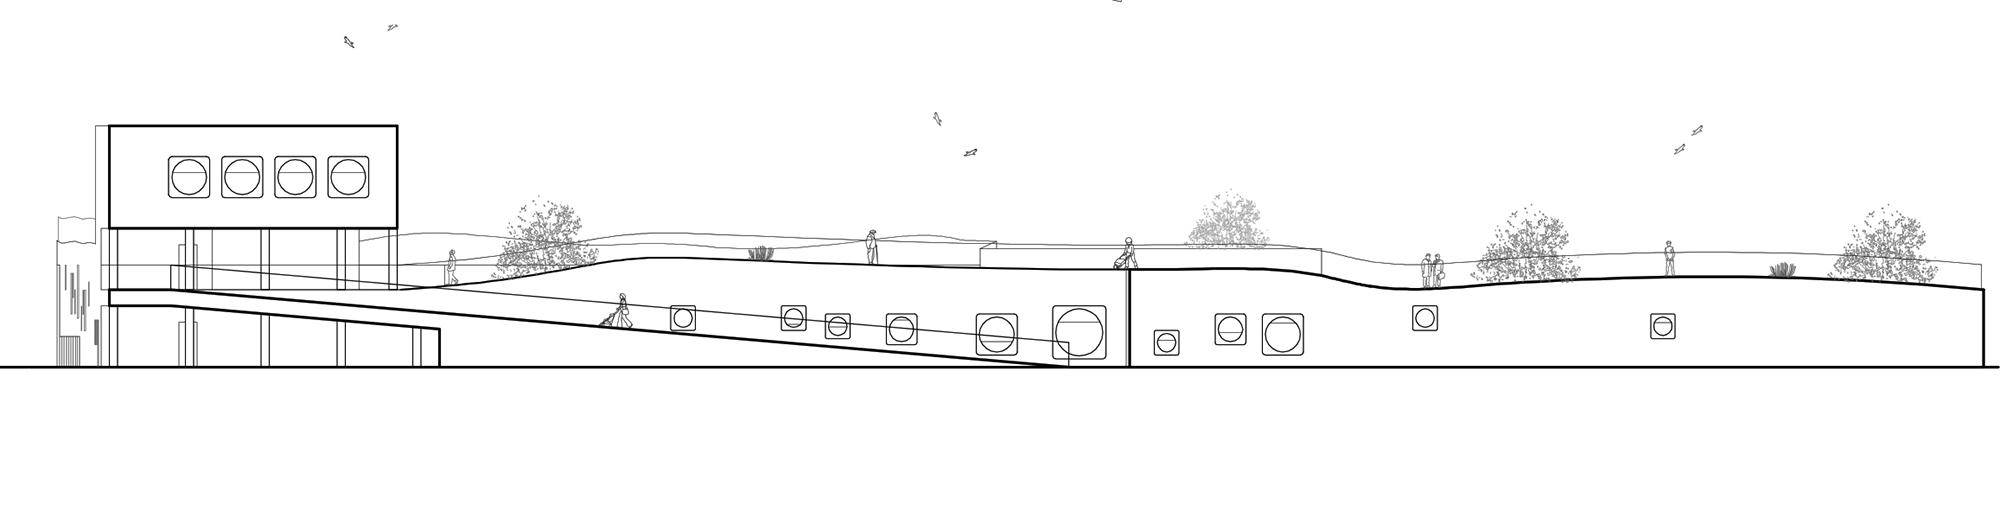 Architektur_offizin-a_gatto.weber.architekten_Projekte_Kultur_HiBaloo_04.jpg